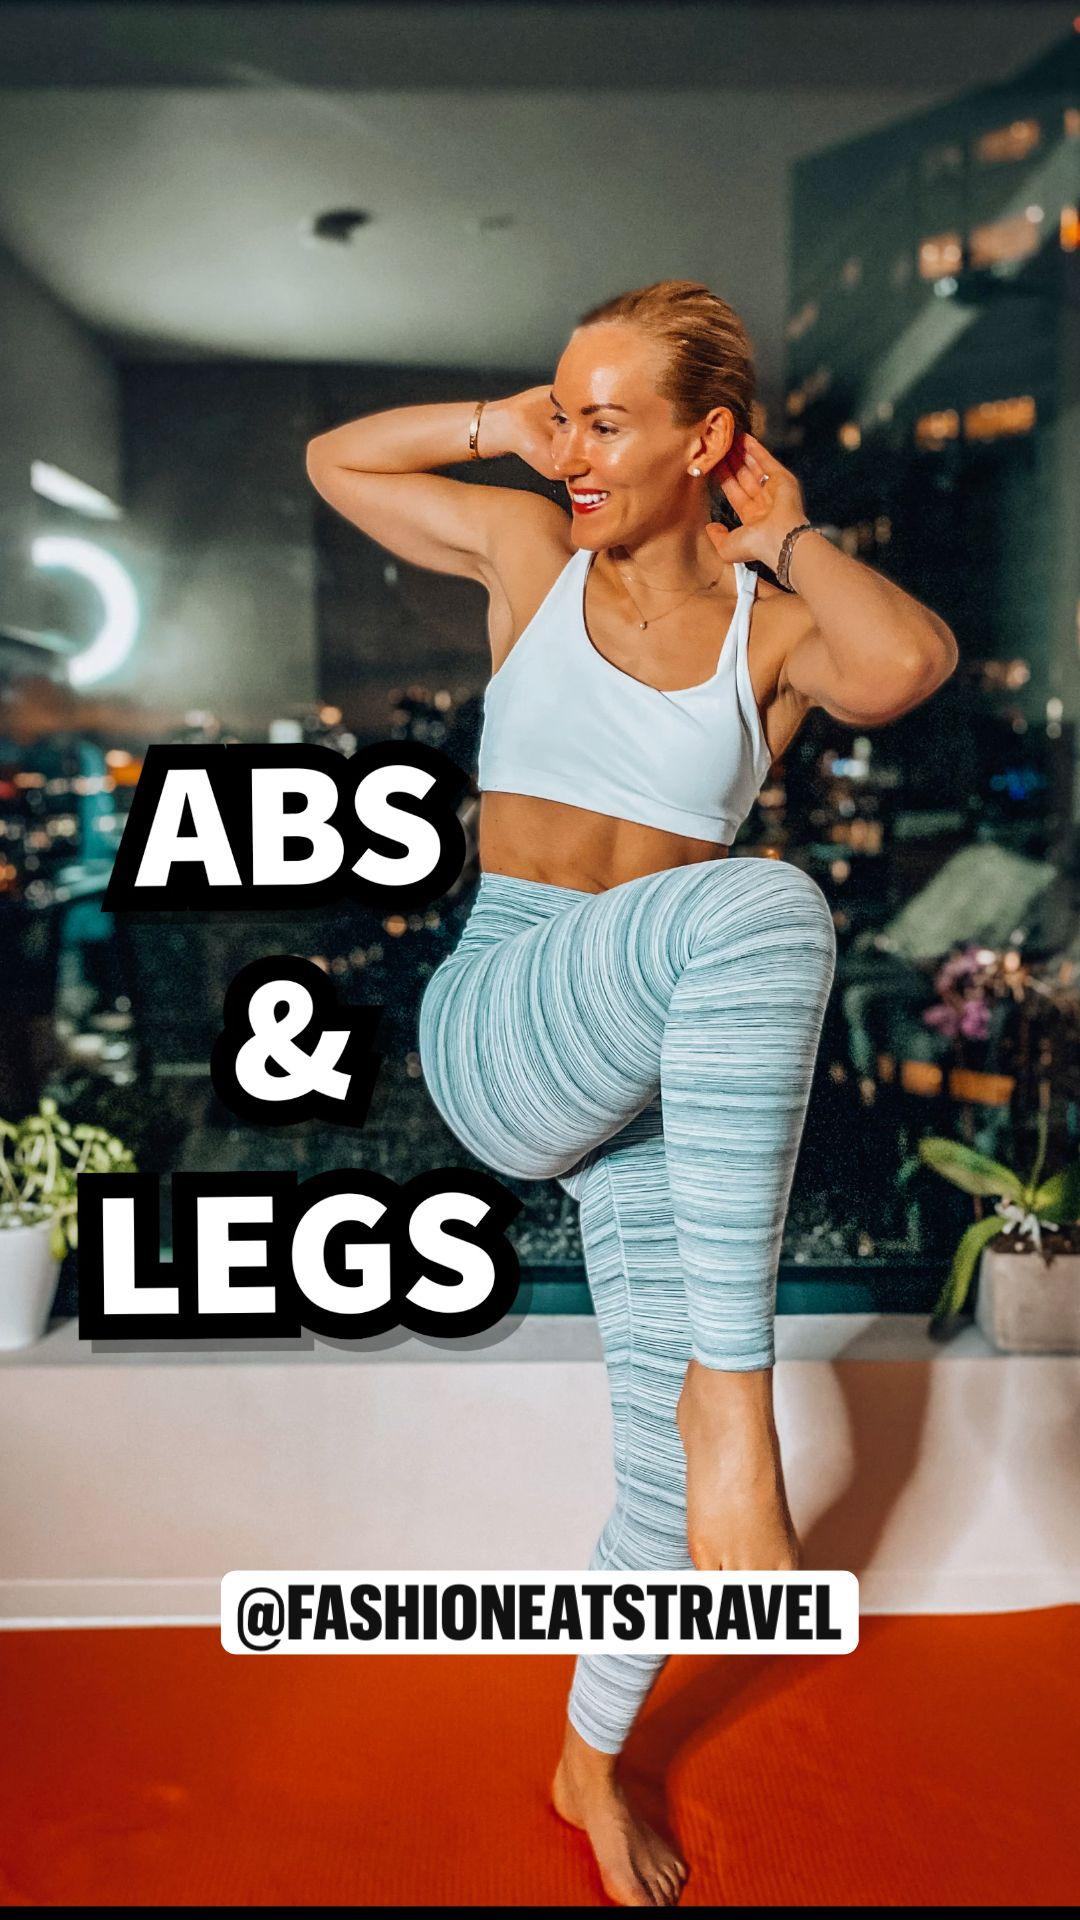 ABS & LEGS WORKOUT @fashioneatstravel